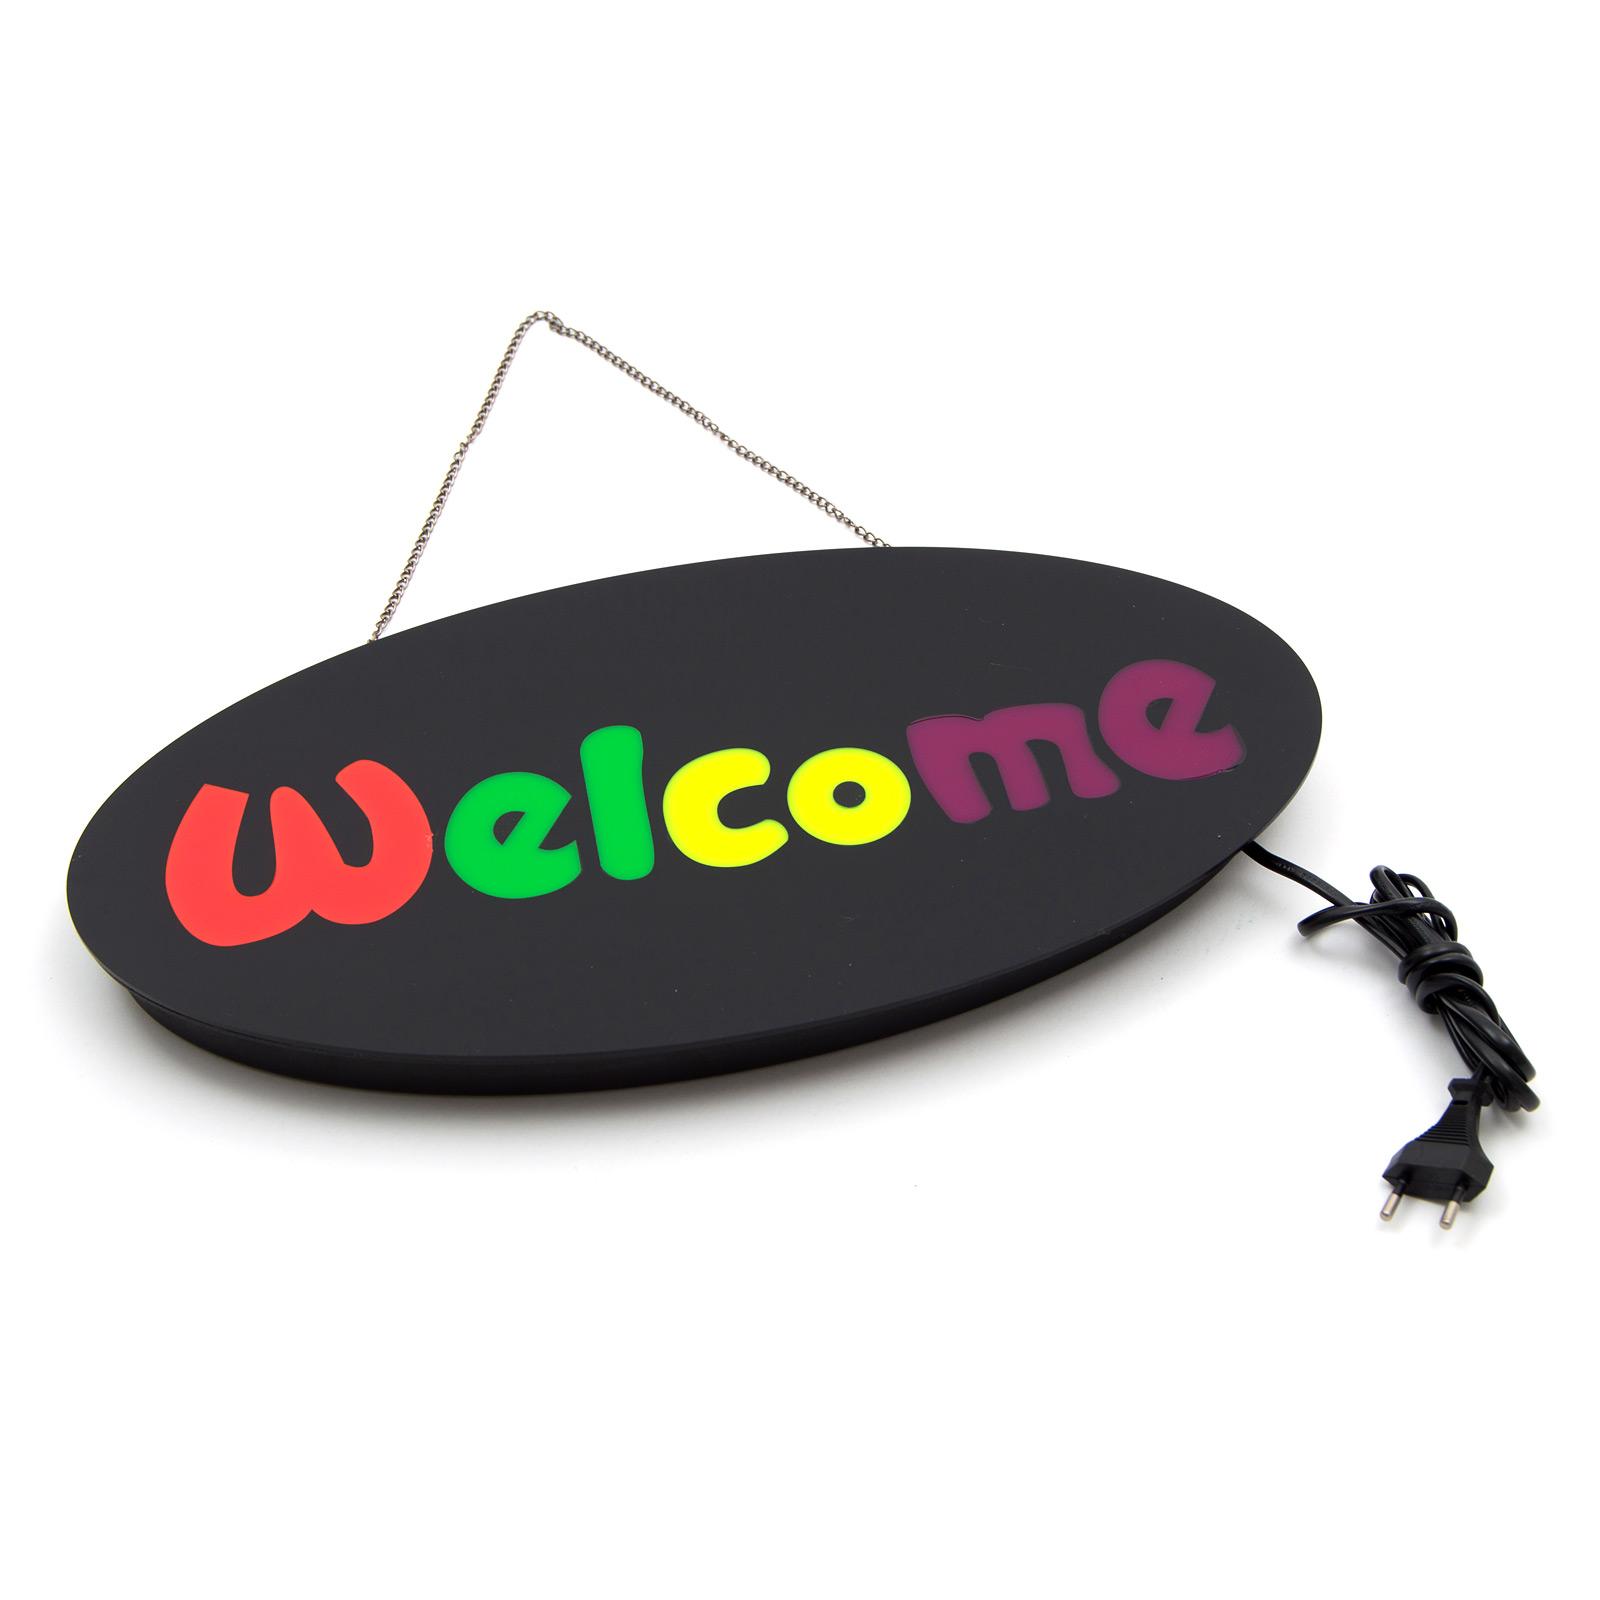 LED Schild Leuchtreklame Motiv: Welcome Farbe: bunt